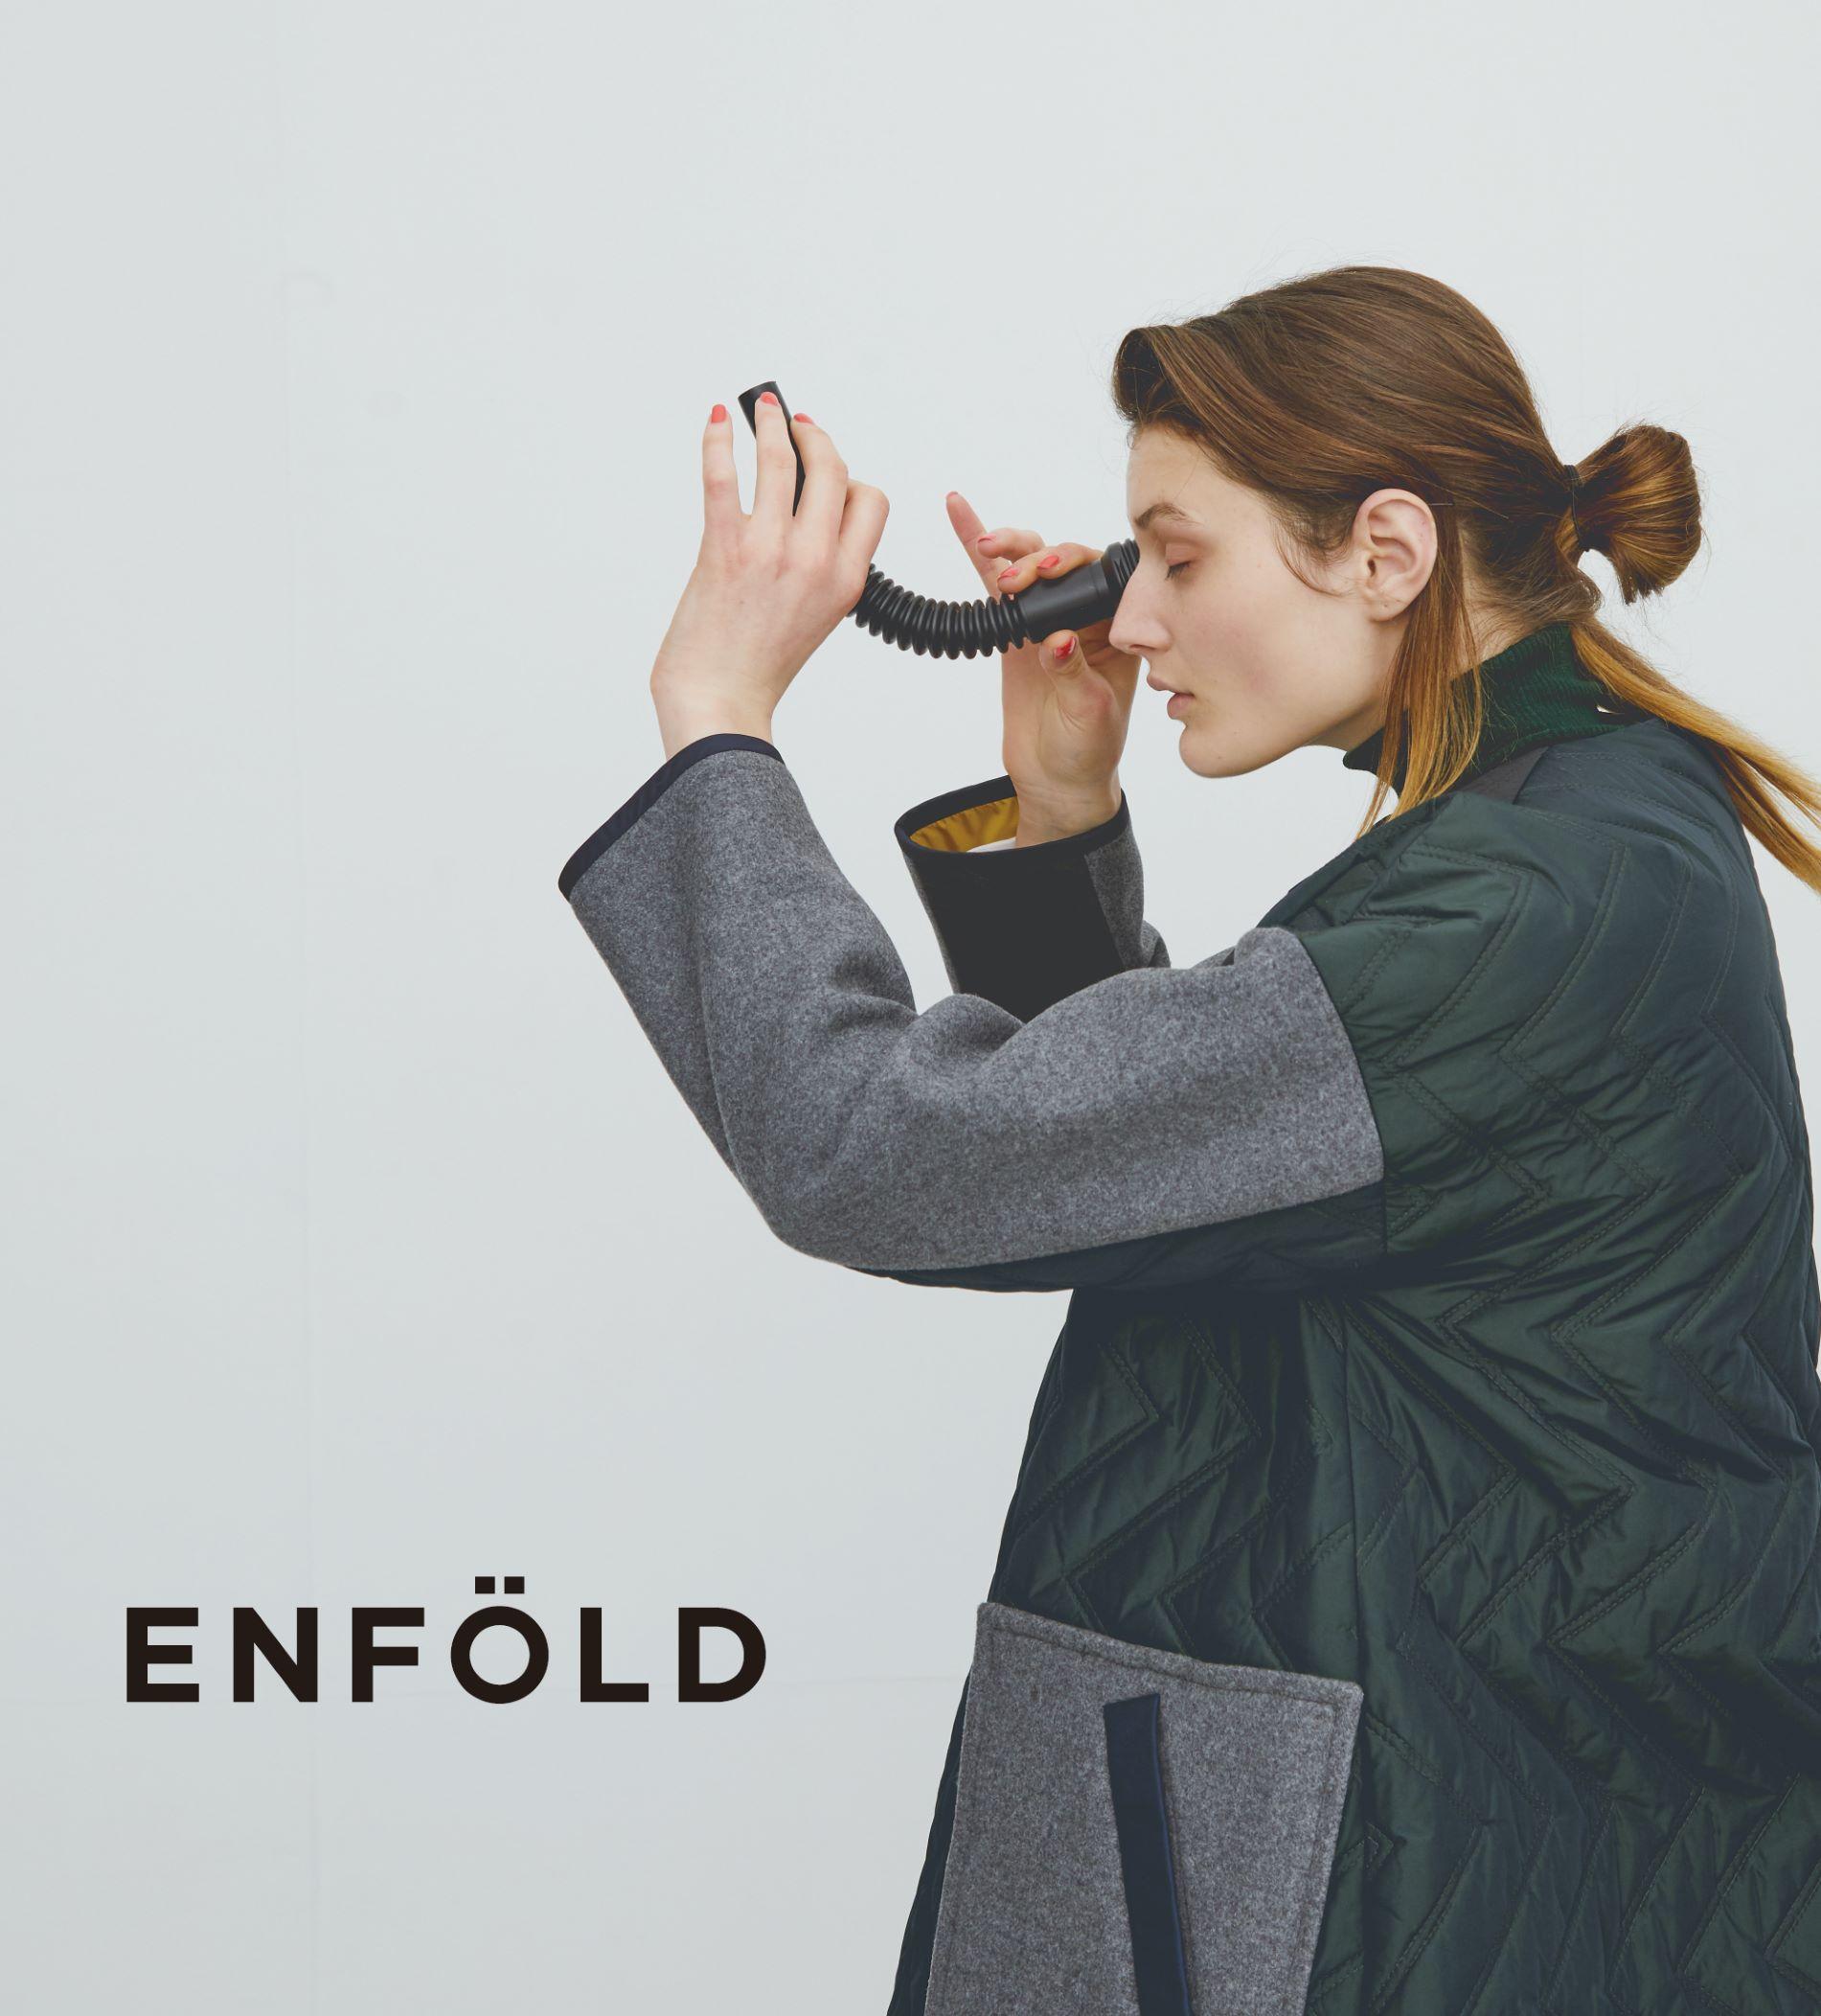 ENFOLD繊研新聞社様 ご提出(19年春夏百貨店バイヤーズ賞)4mp